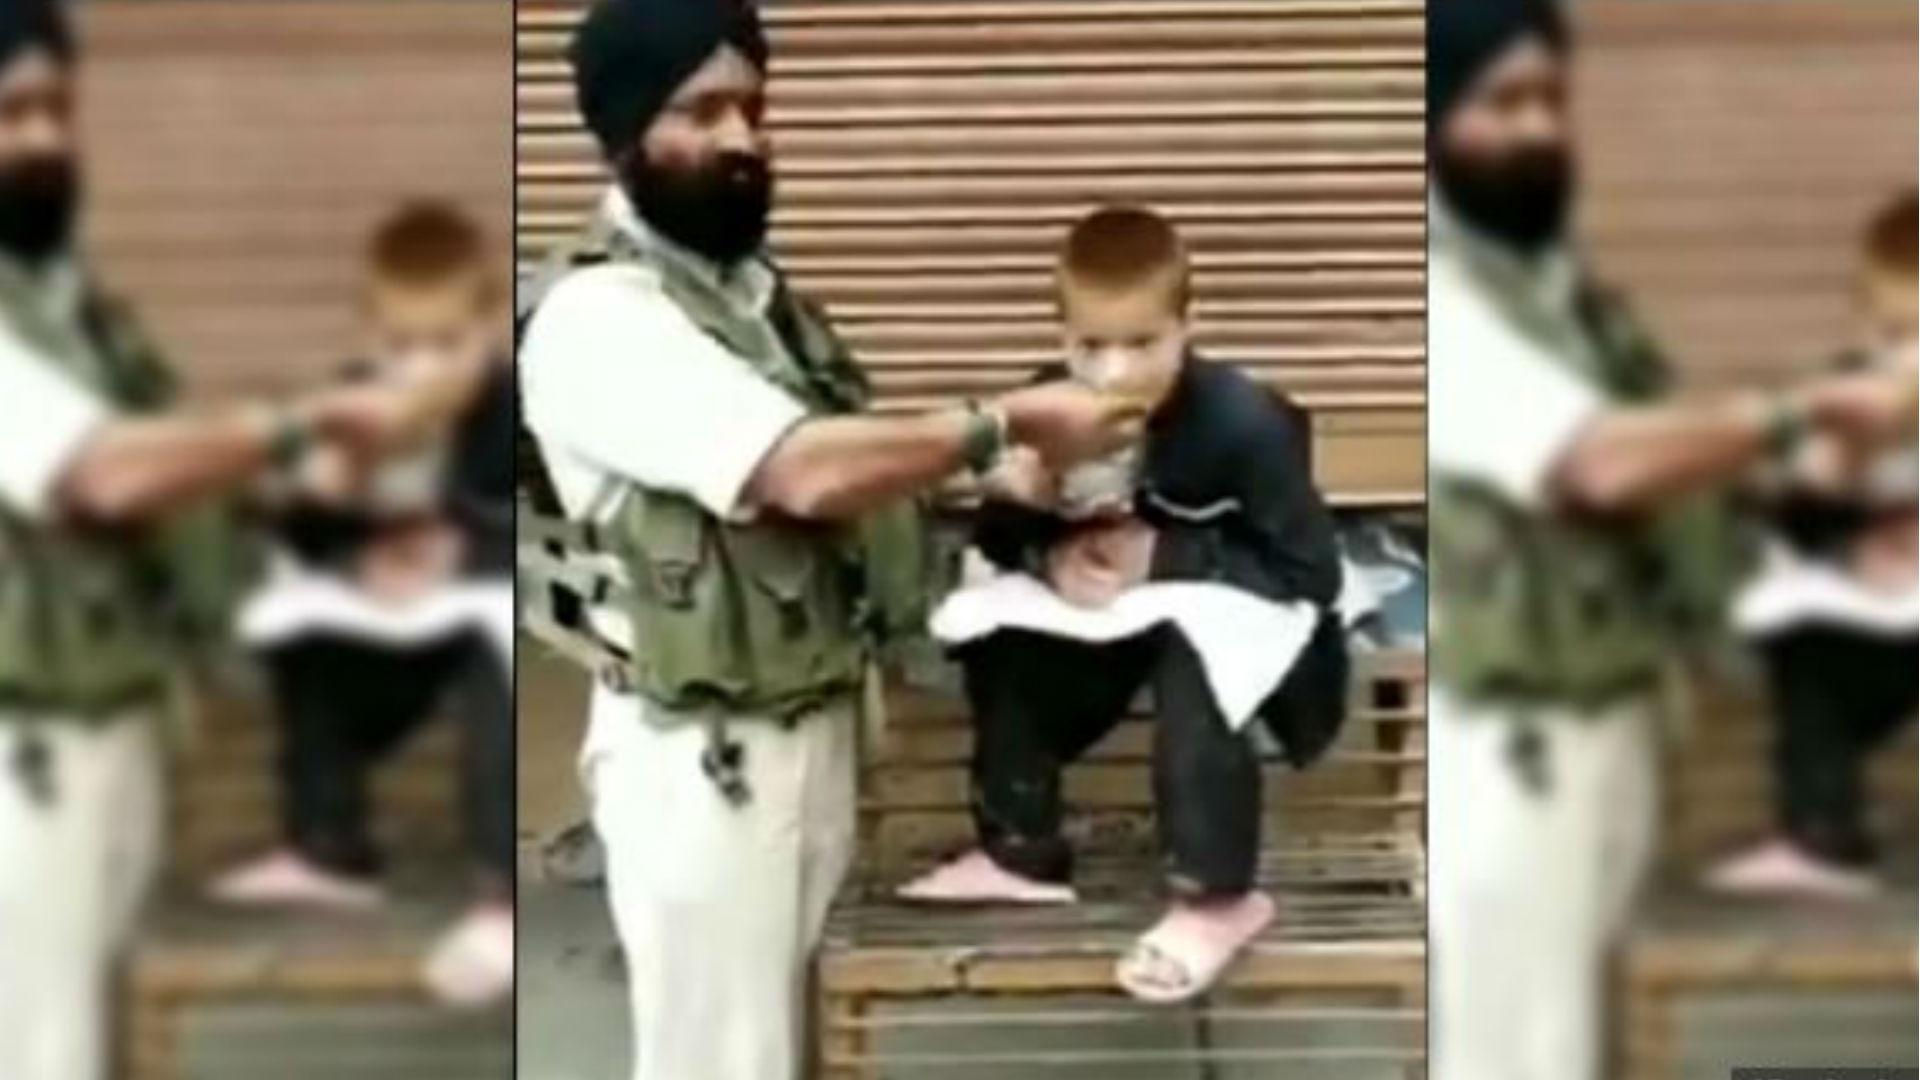 सीआरपीएफ जवान ने पेश की मिसाल, लकवाग्रस्त बच्चे को अपना खाना खिलाते हुए वीडियो वायरल